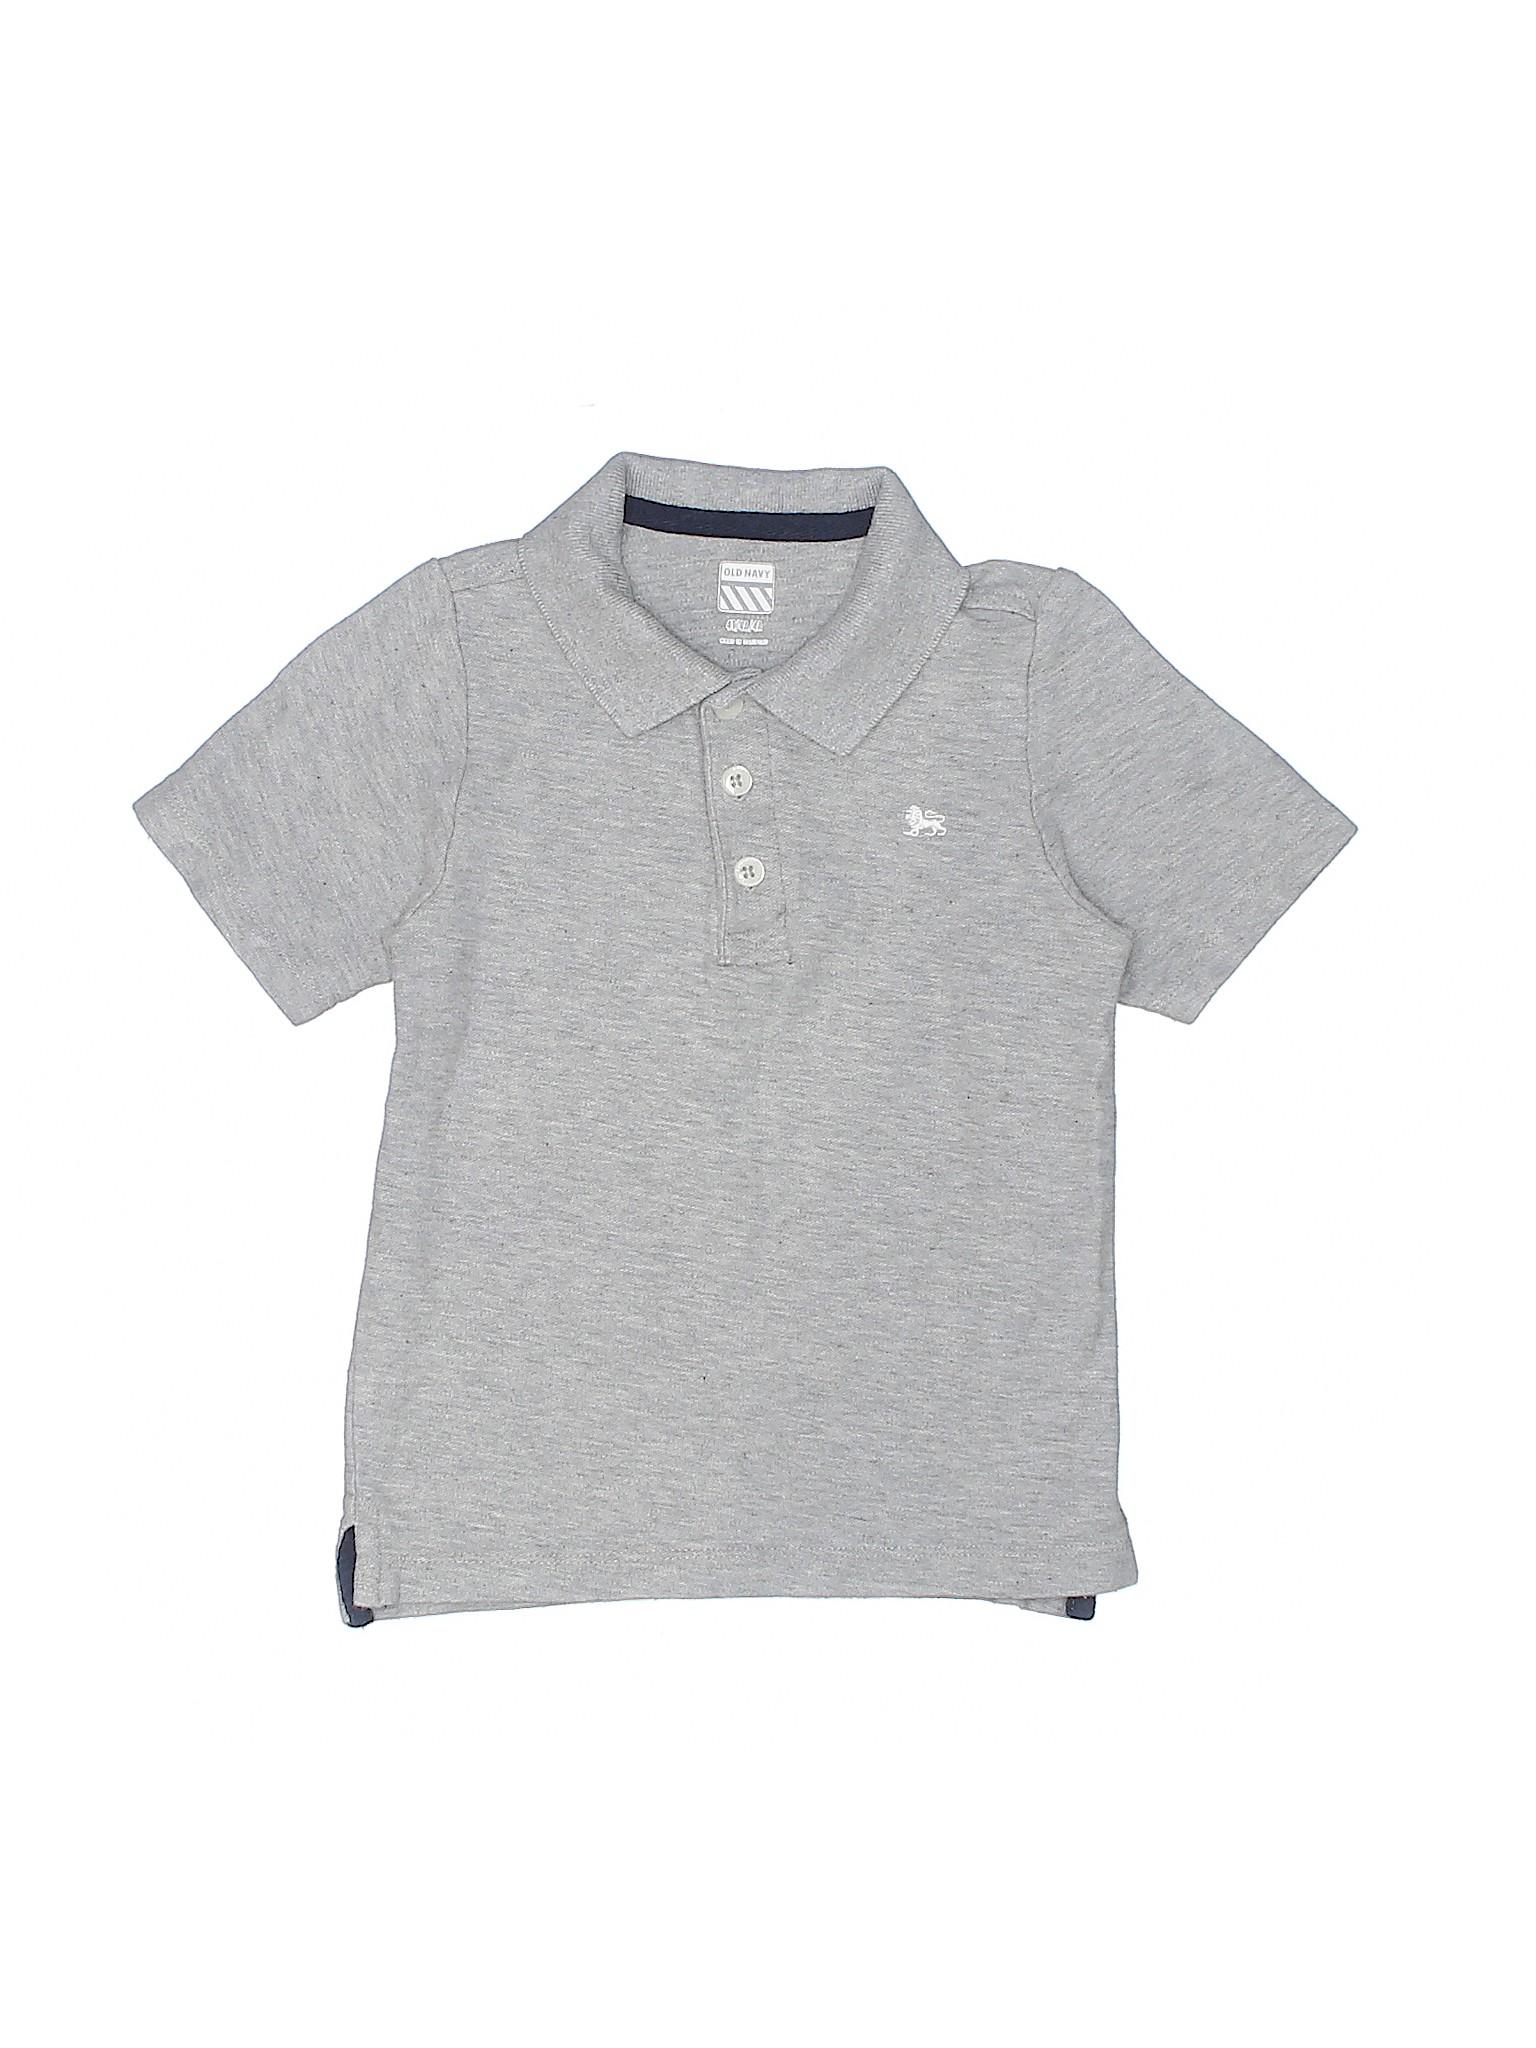 081830b7d09b Old Navy Mens Polo Shirts - DREAMWORKS